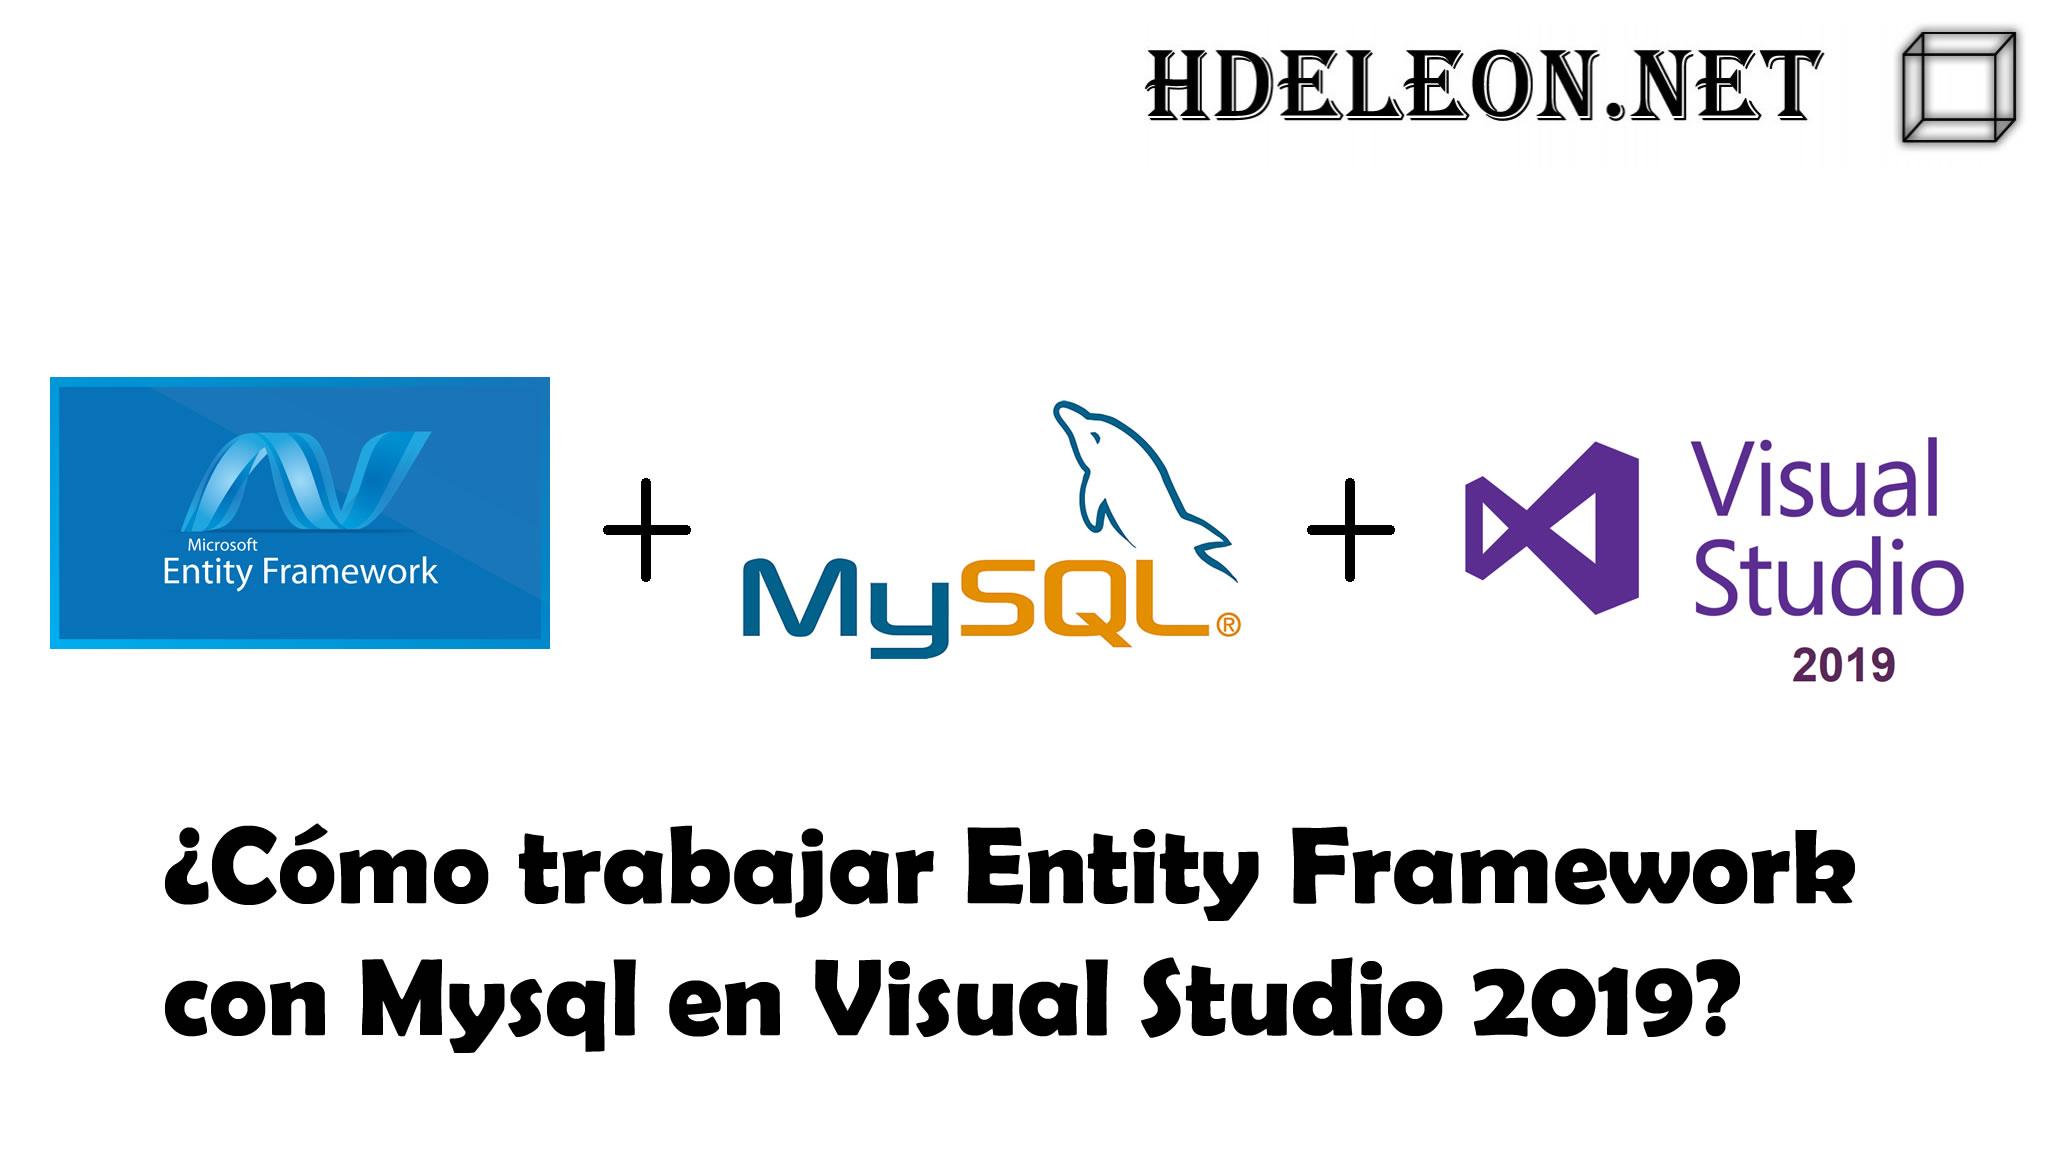 ¿Cómo trabajar Entity Framework con Mysql en Visual Studio 2019?